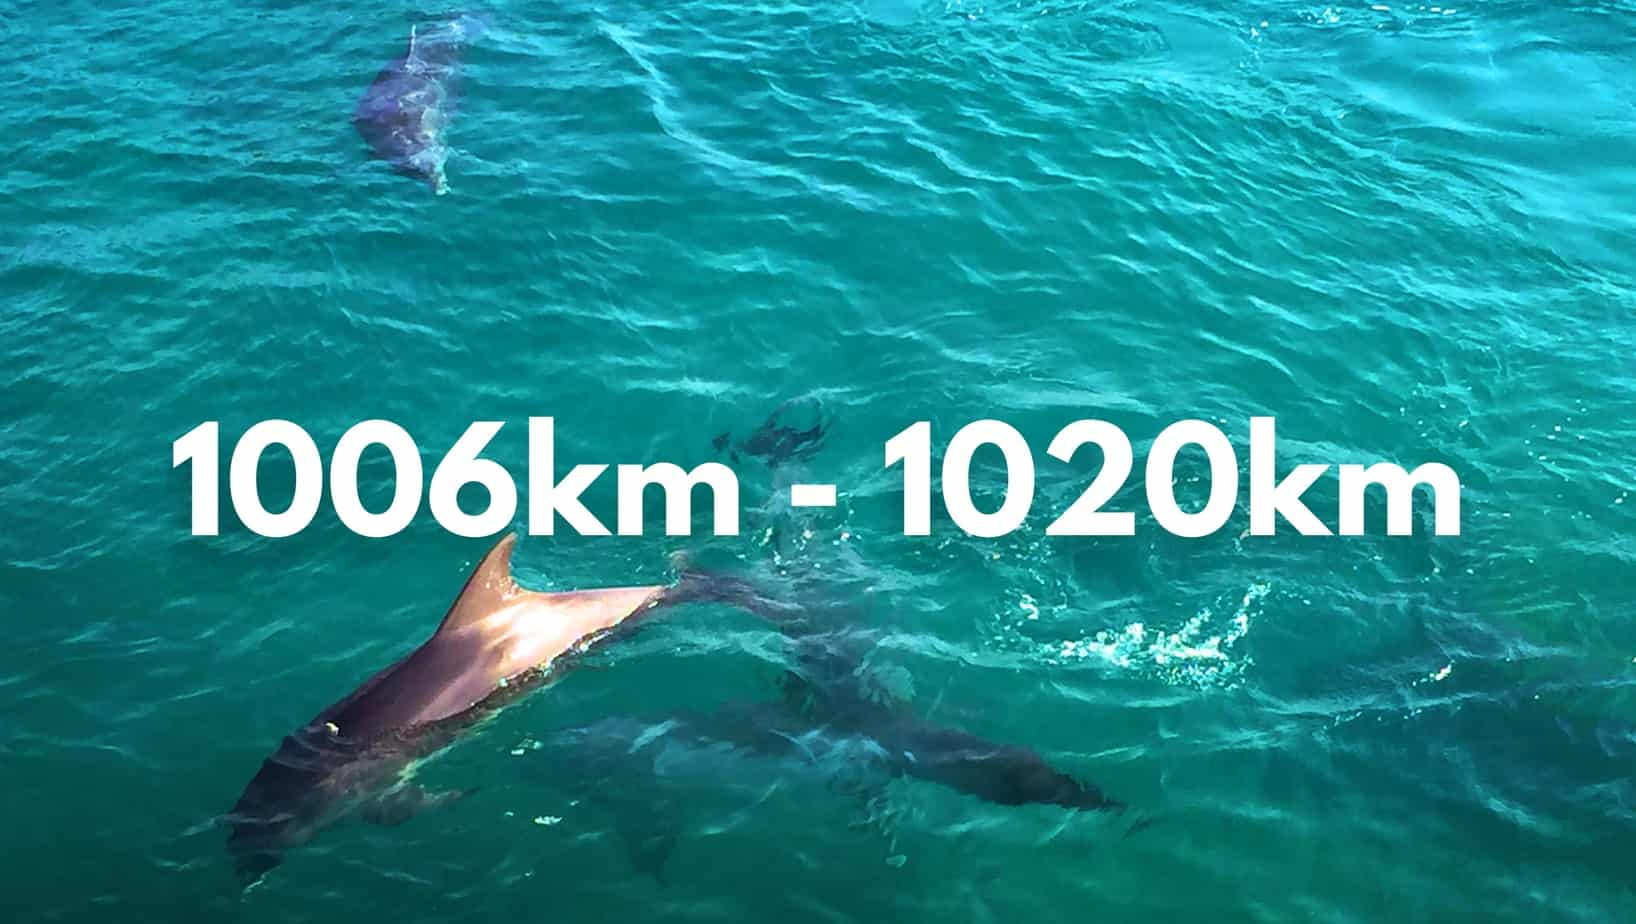 1006-1020km